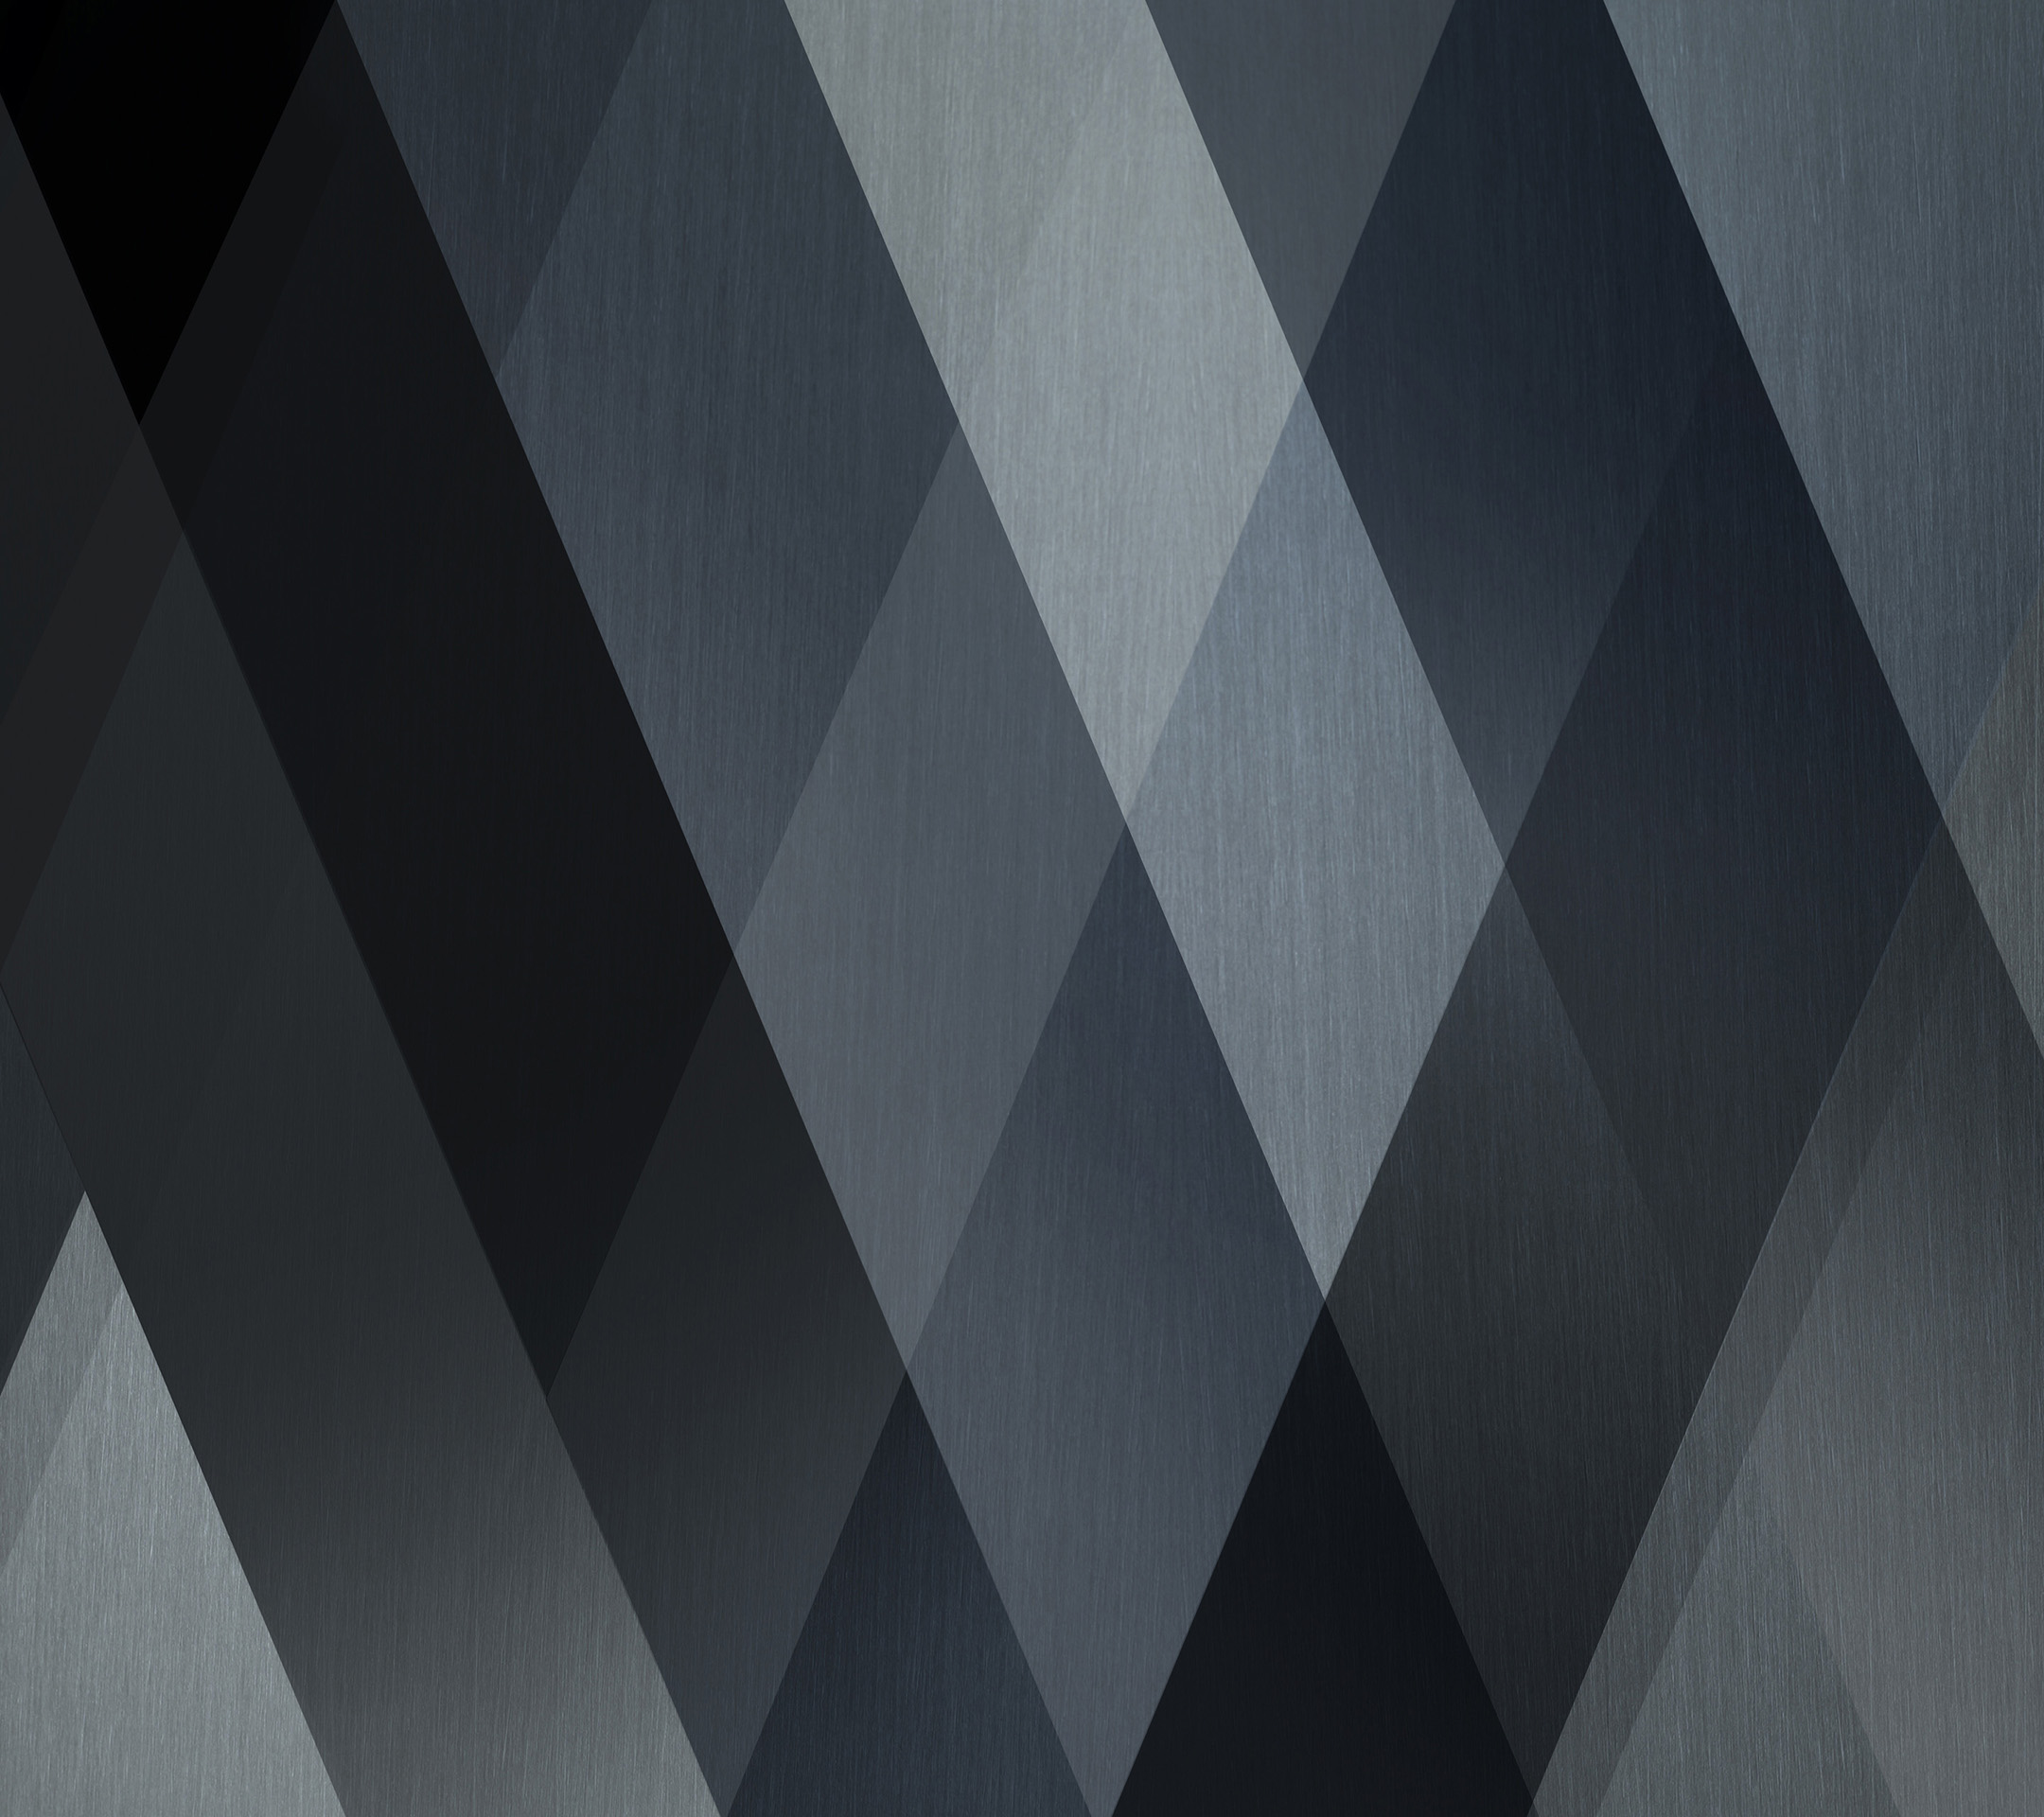 LG X Venture Stock Wallpapers: LG X Venture Stock Wallpaper 02